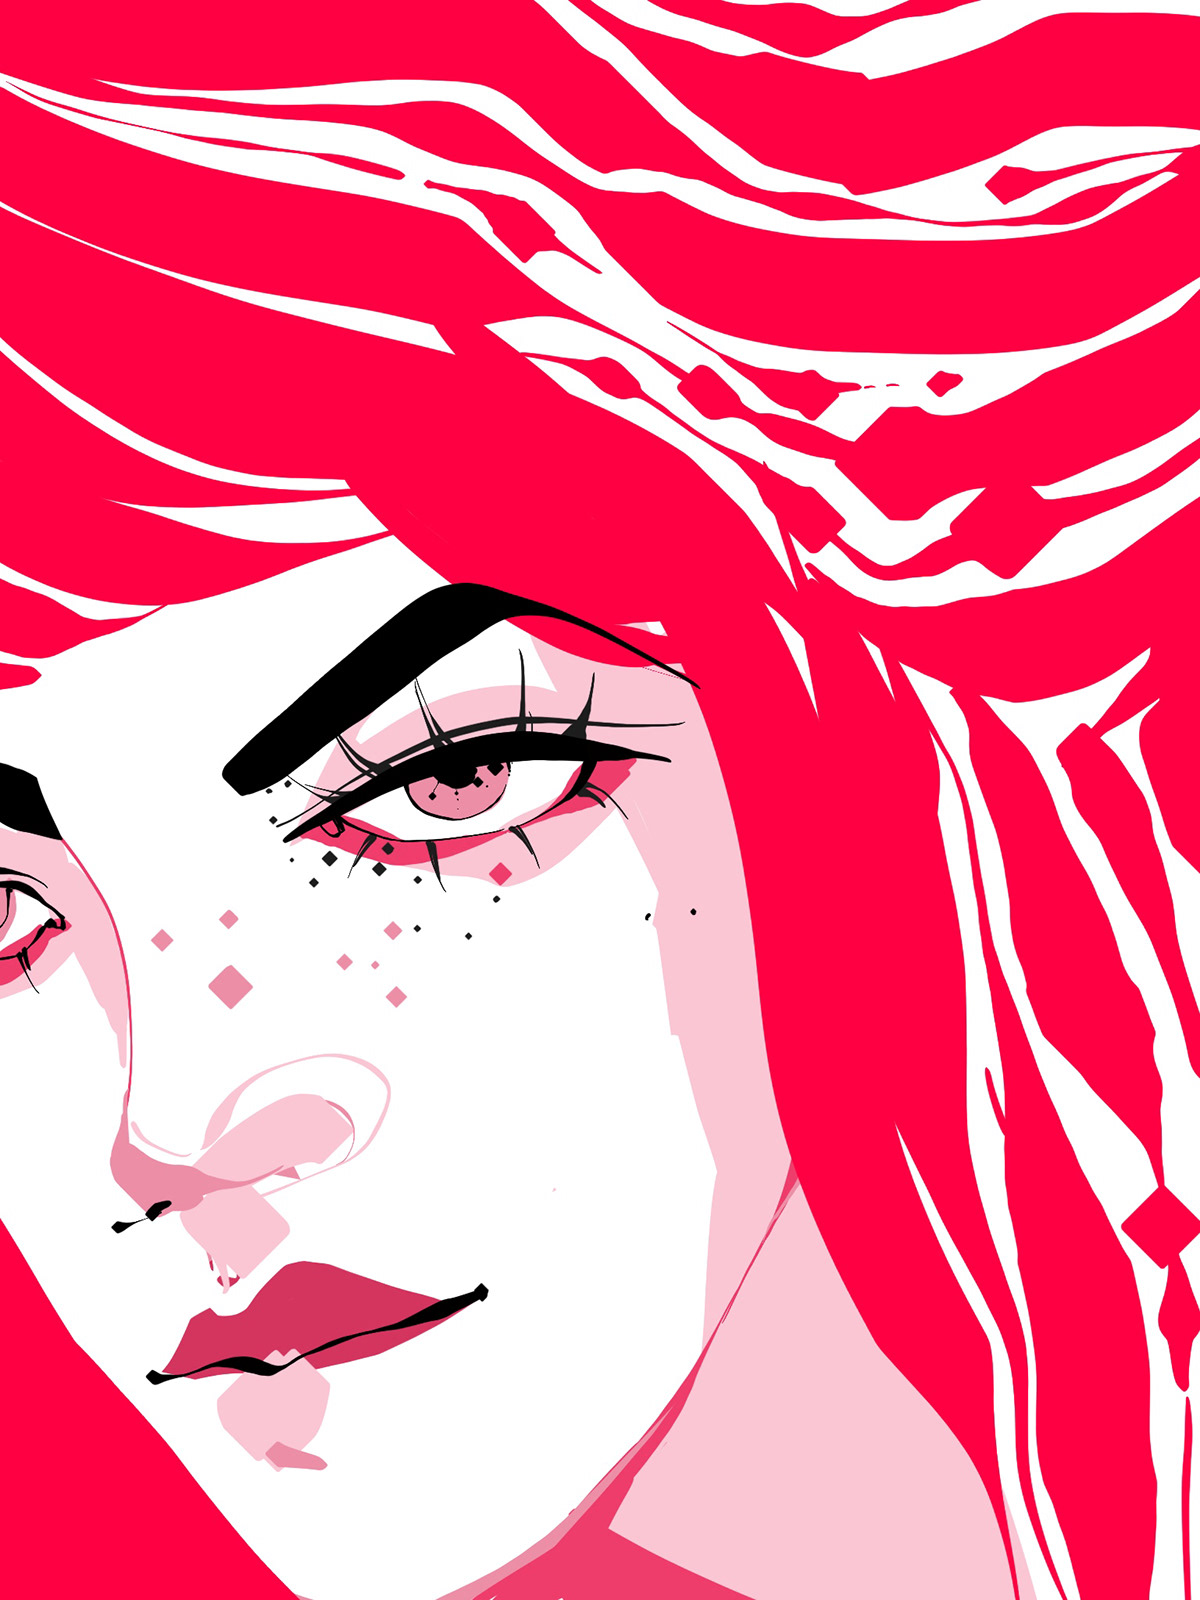 draw adobe illustrator comics illustrations Isometric apple pencil Procreate